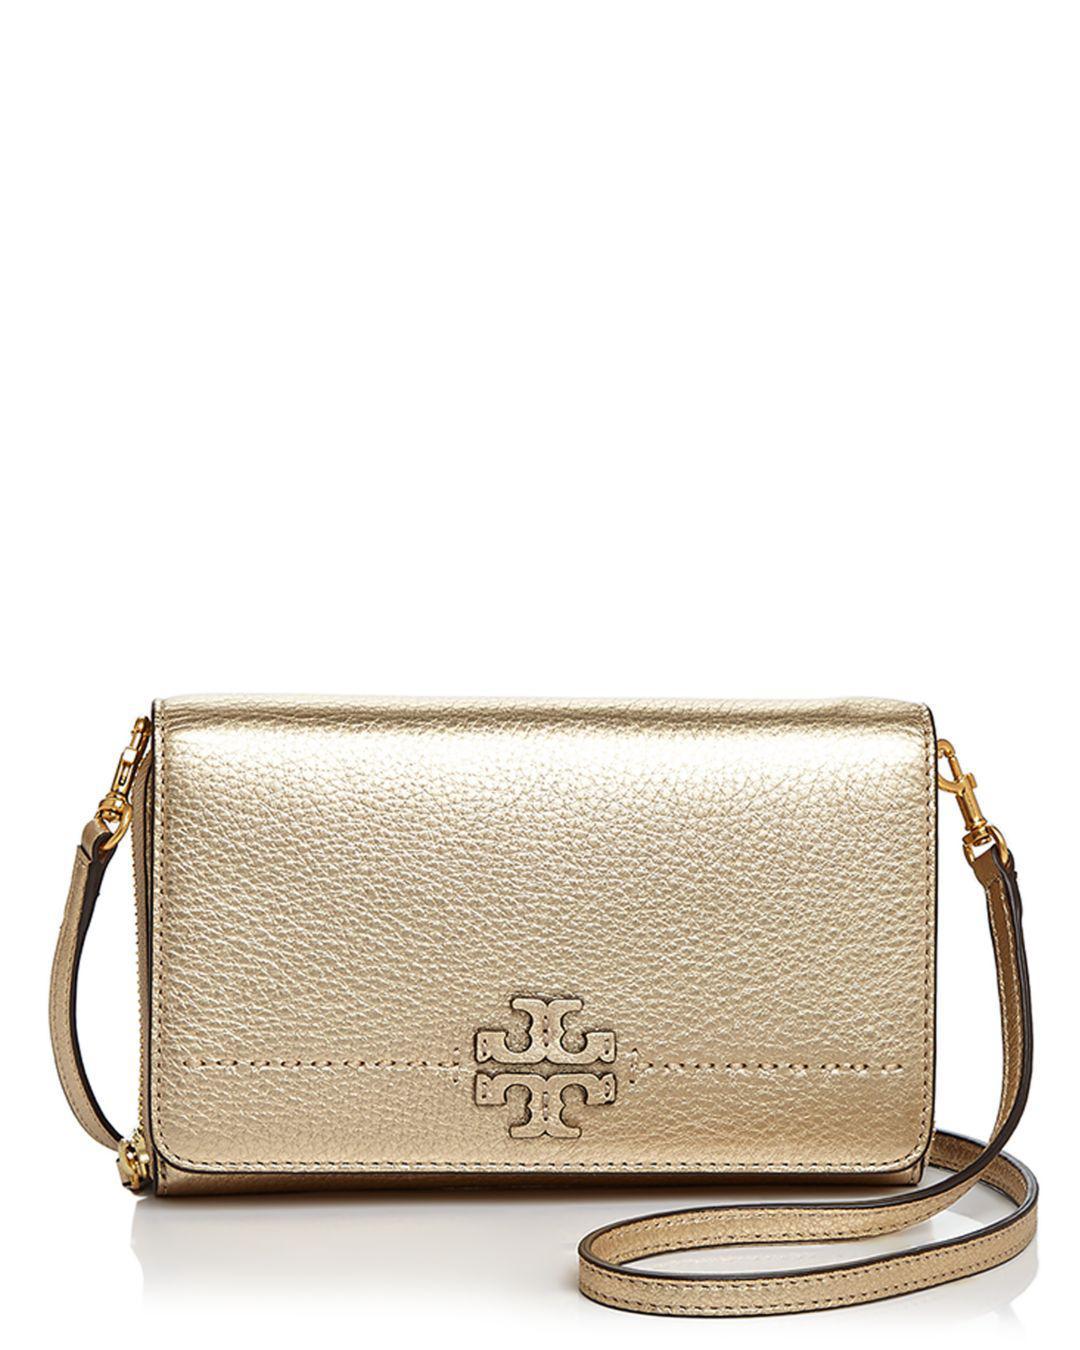 8070d1fb5c4b Lyst - Tory Burch Mcgraw Flat Leather Wallet Crossbody in Metallic ...